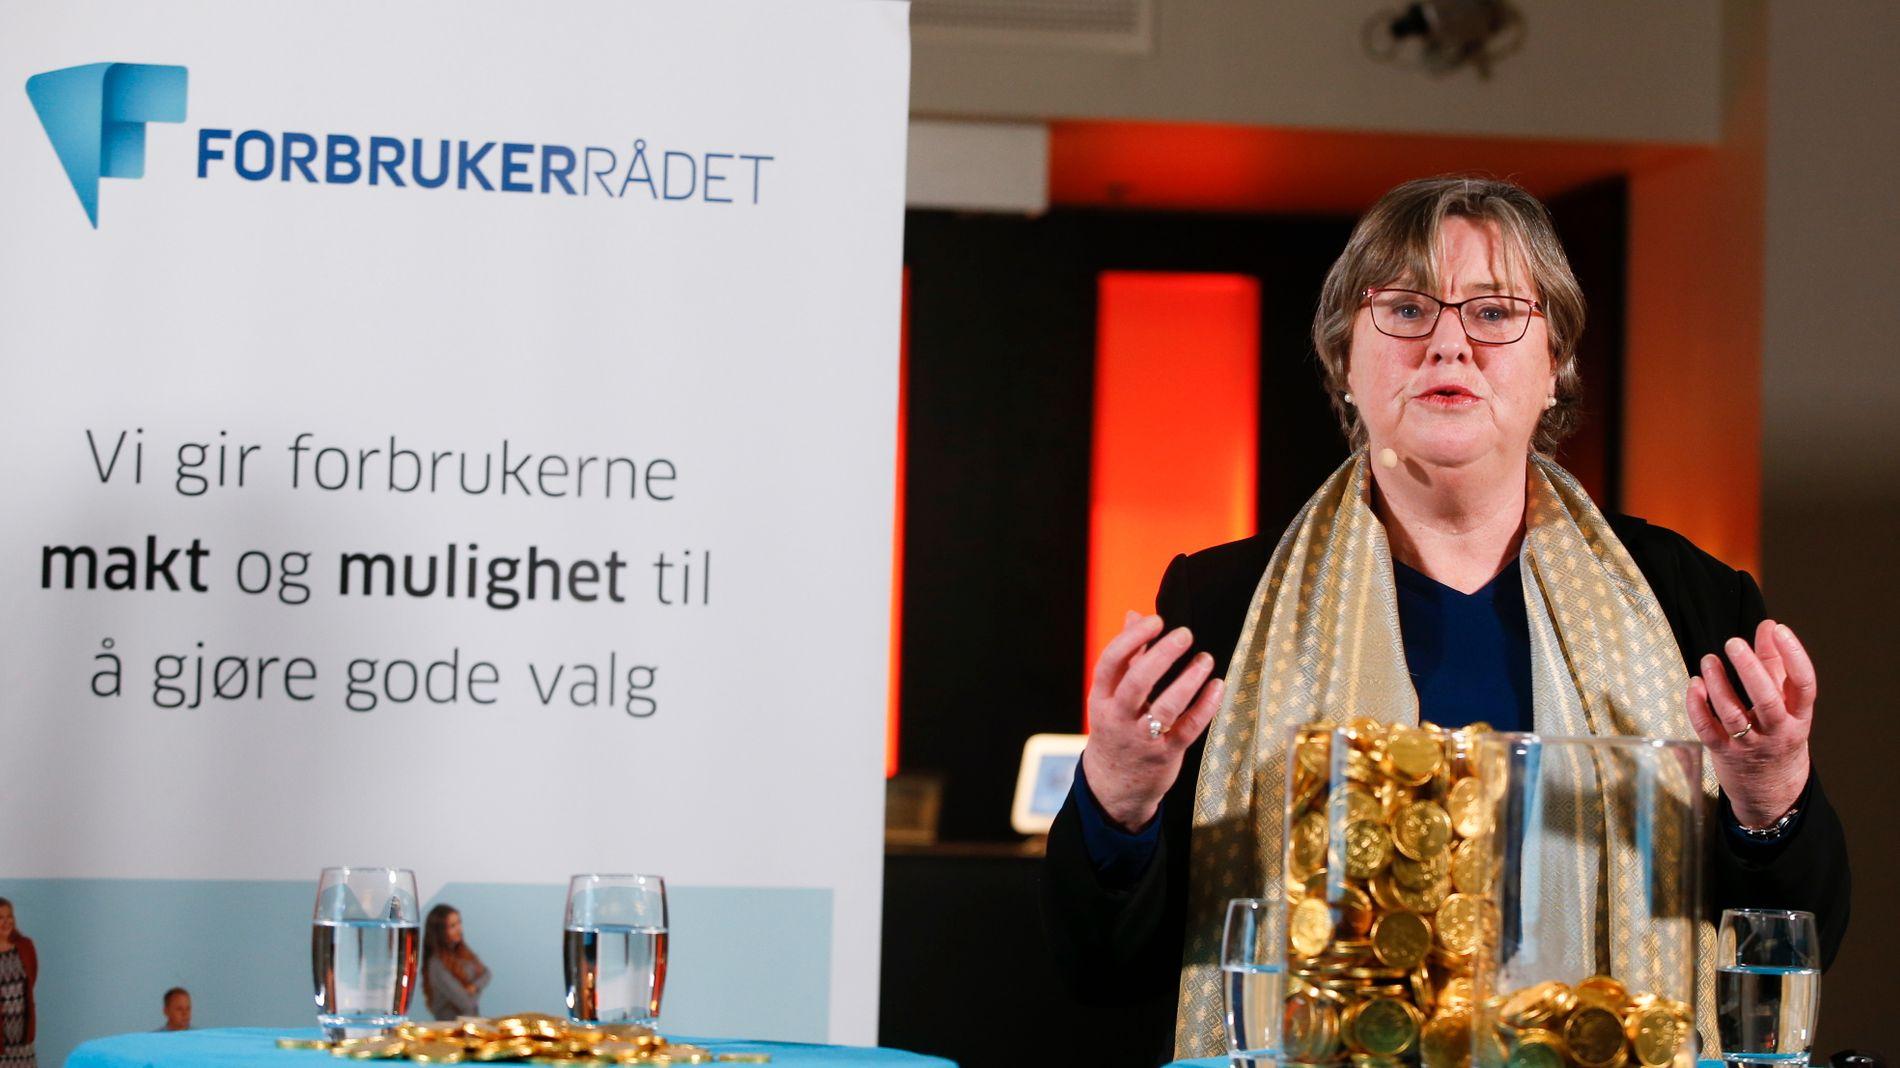 IKKE RART: Elisabeth Realfsen i Finansportalen og Forbrukerrådet forstår at mange er bekymret.